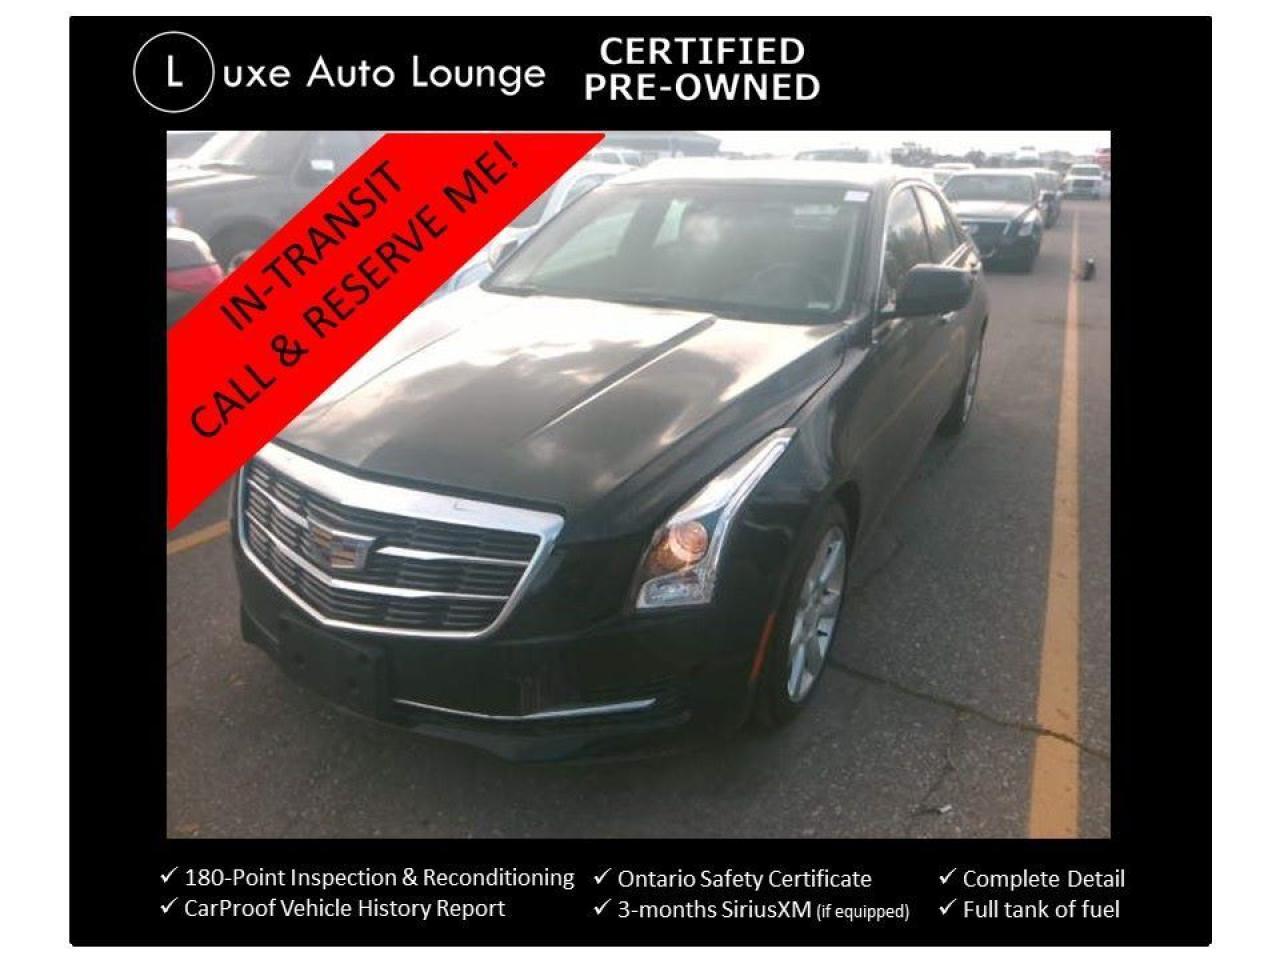 2015 Cadillac ATS 2.0 TURBO, 6-SPEED, SUNROOF, BOSE, CUE!